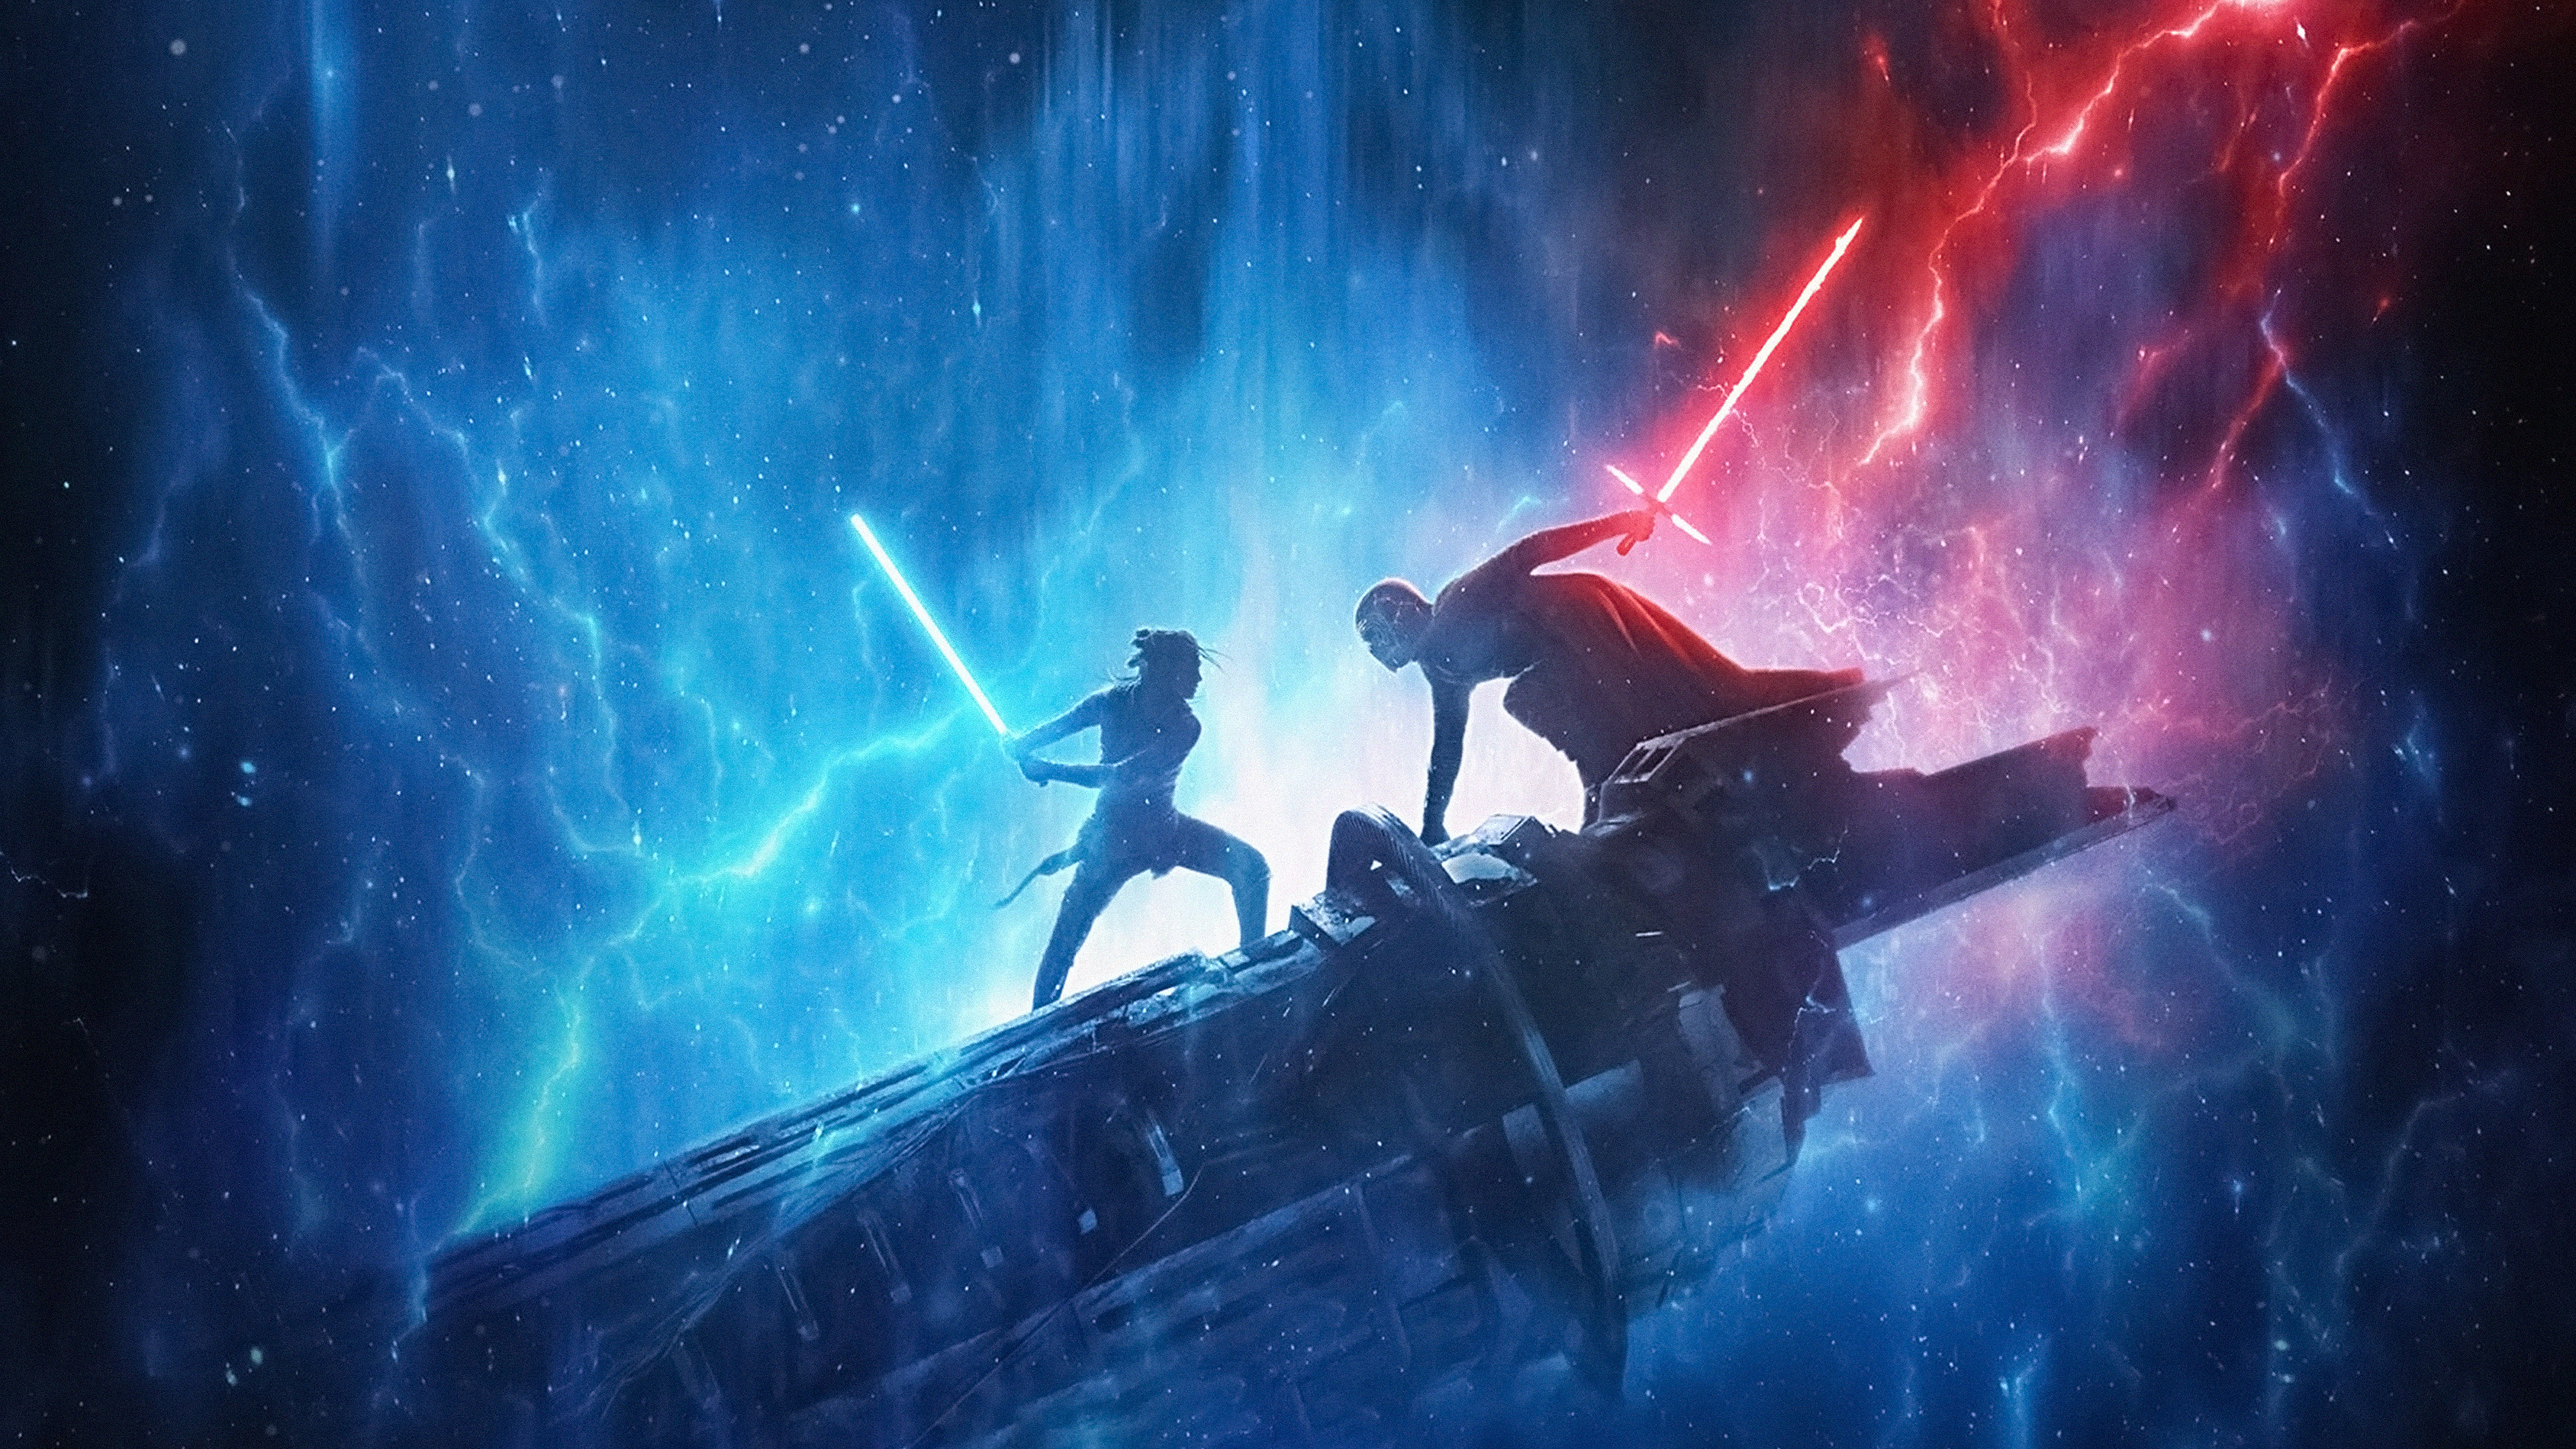 4k Ultra Hd Star Wars Wallpaper